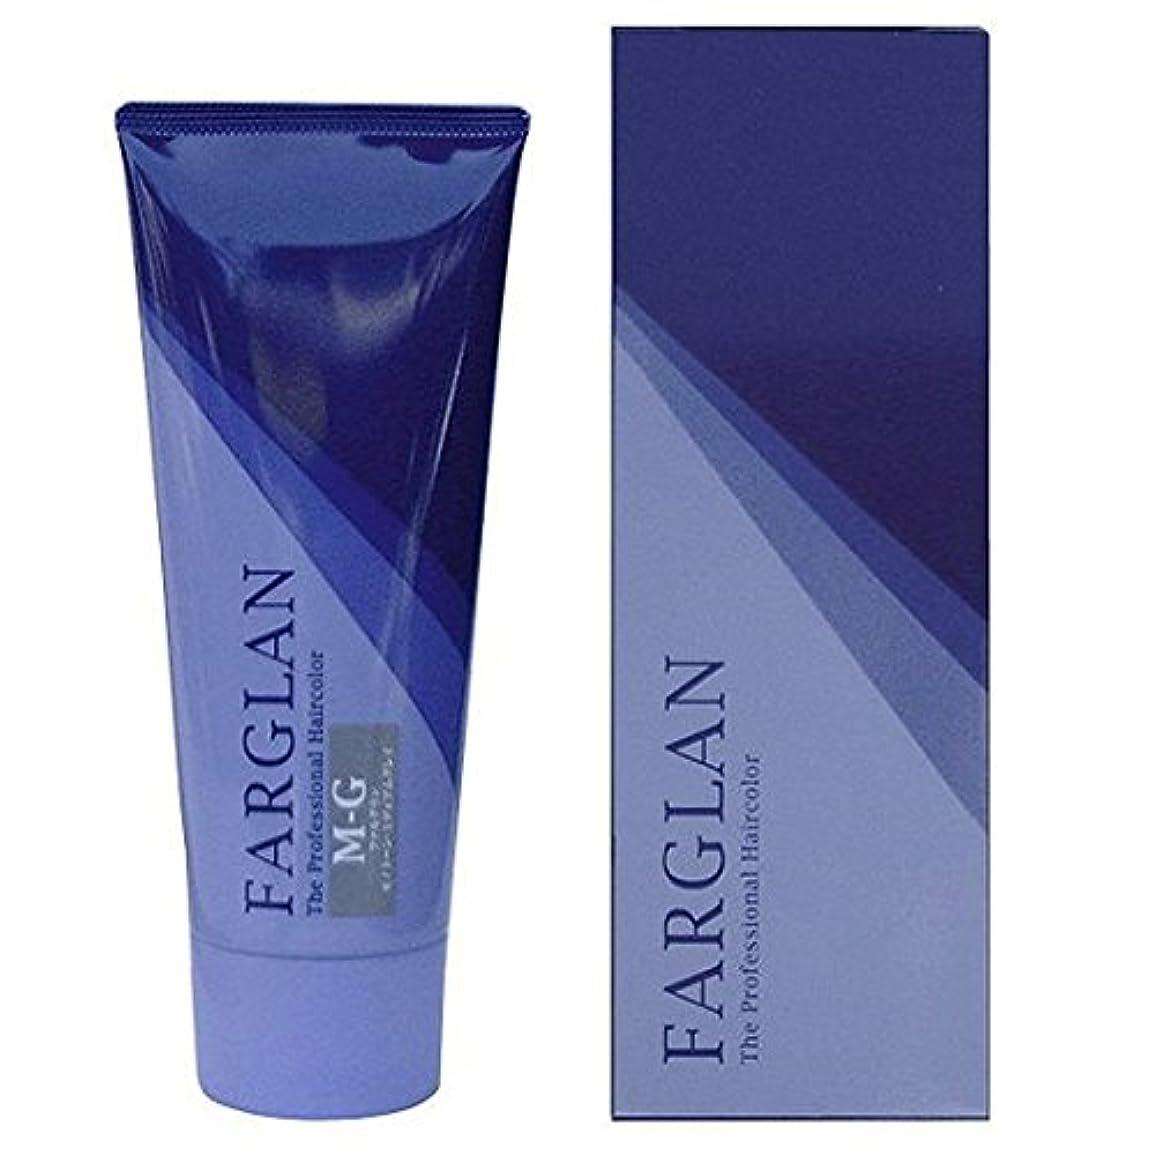 FARGLAN(ファルグラン) ヘアカラー GR(GREEN) 160g